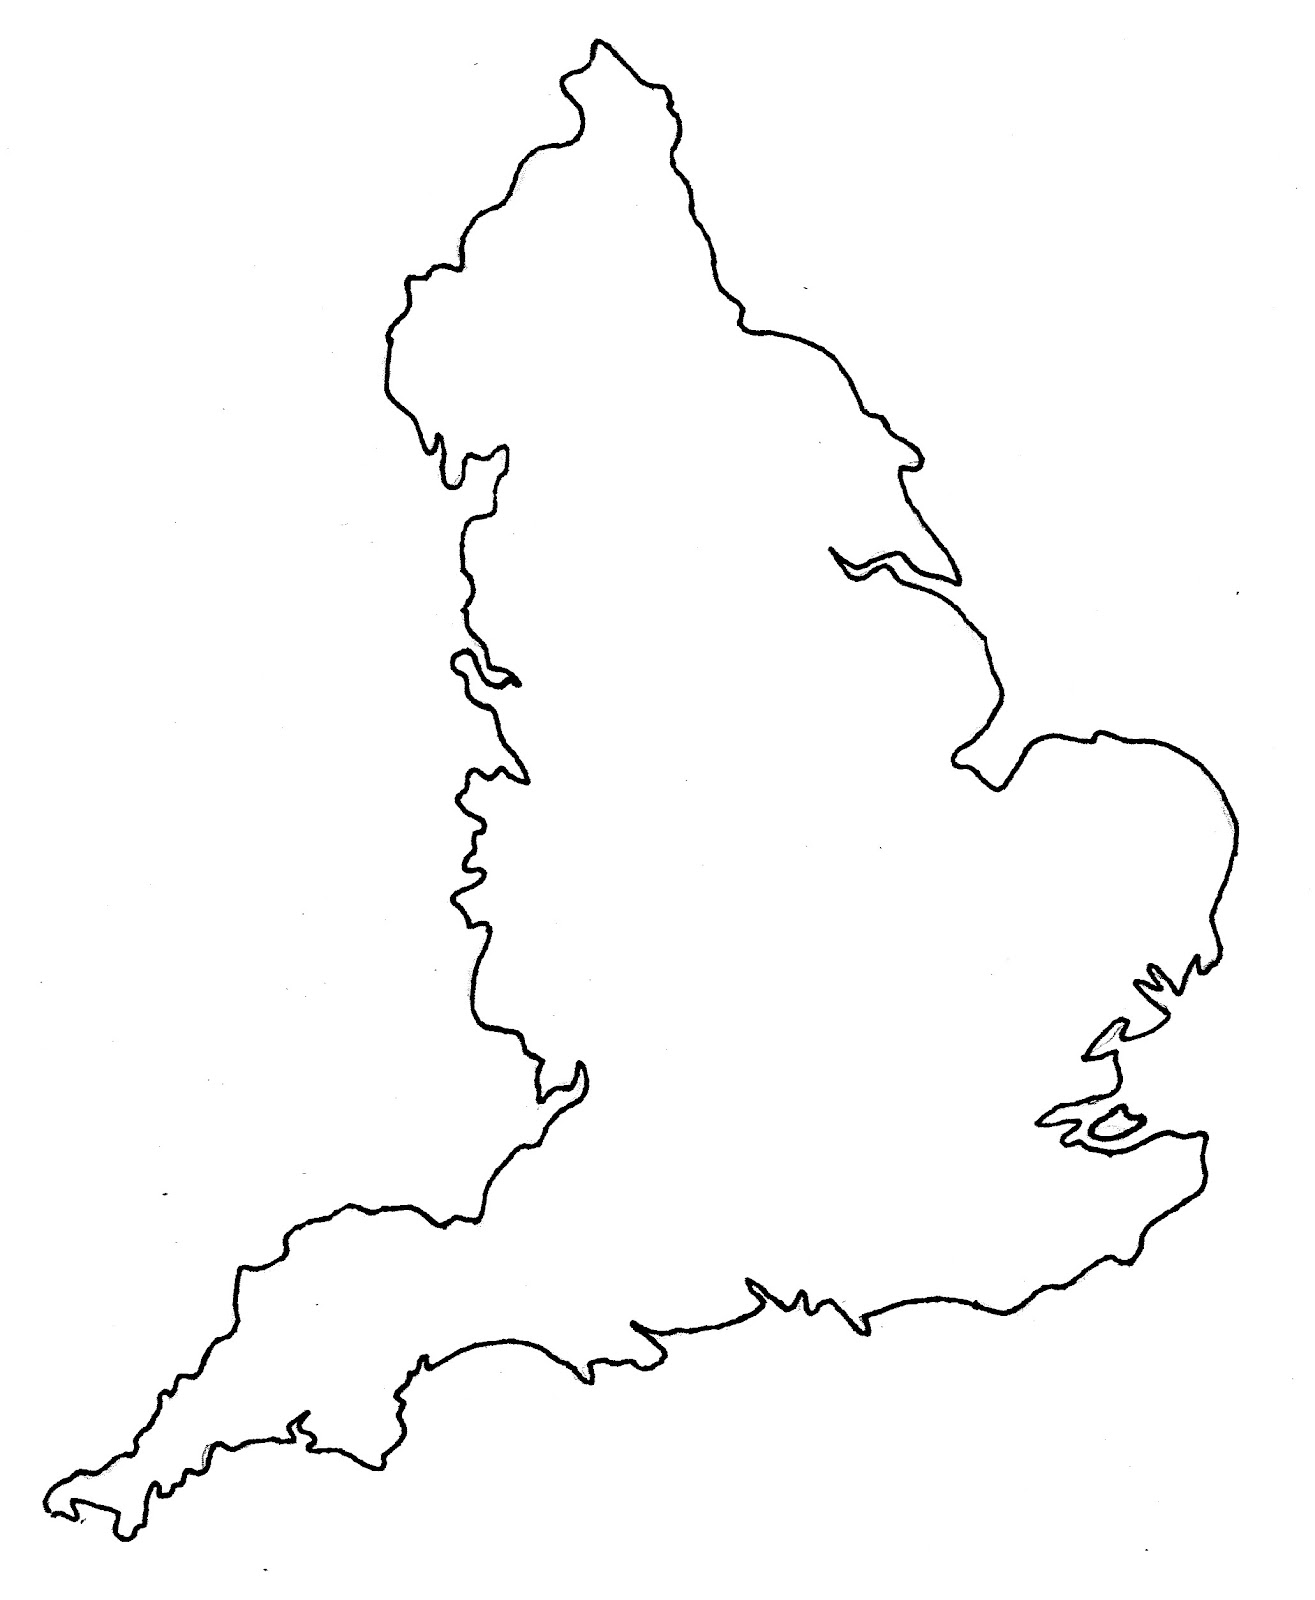 Realmwright: Aengland?